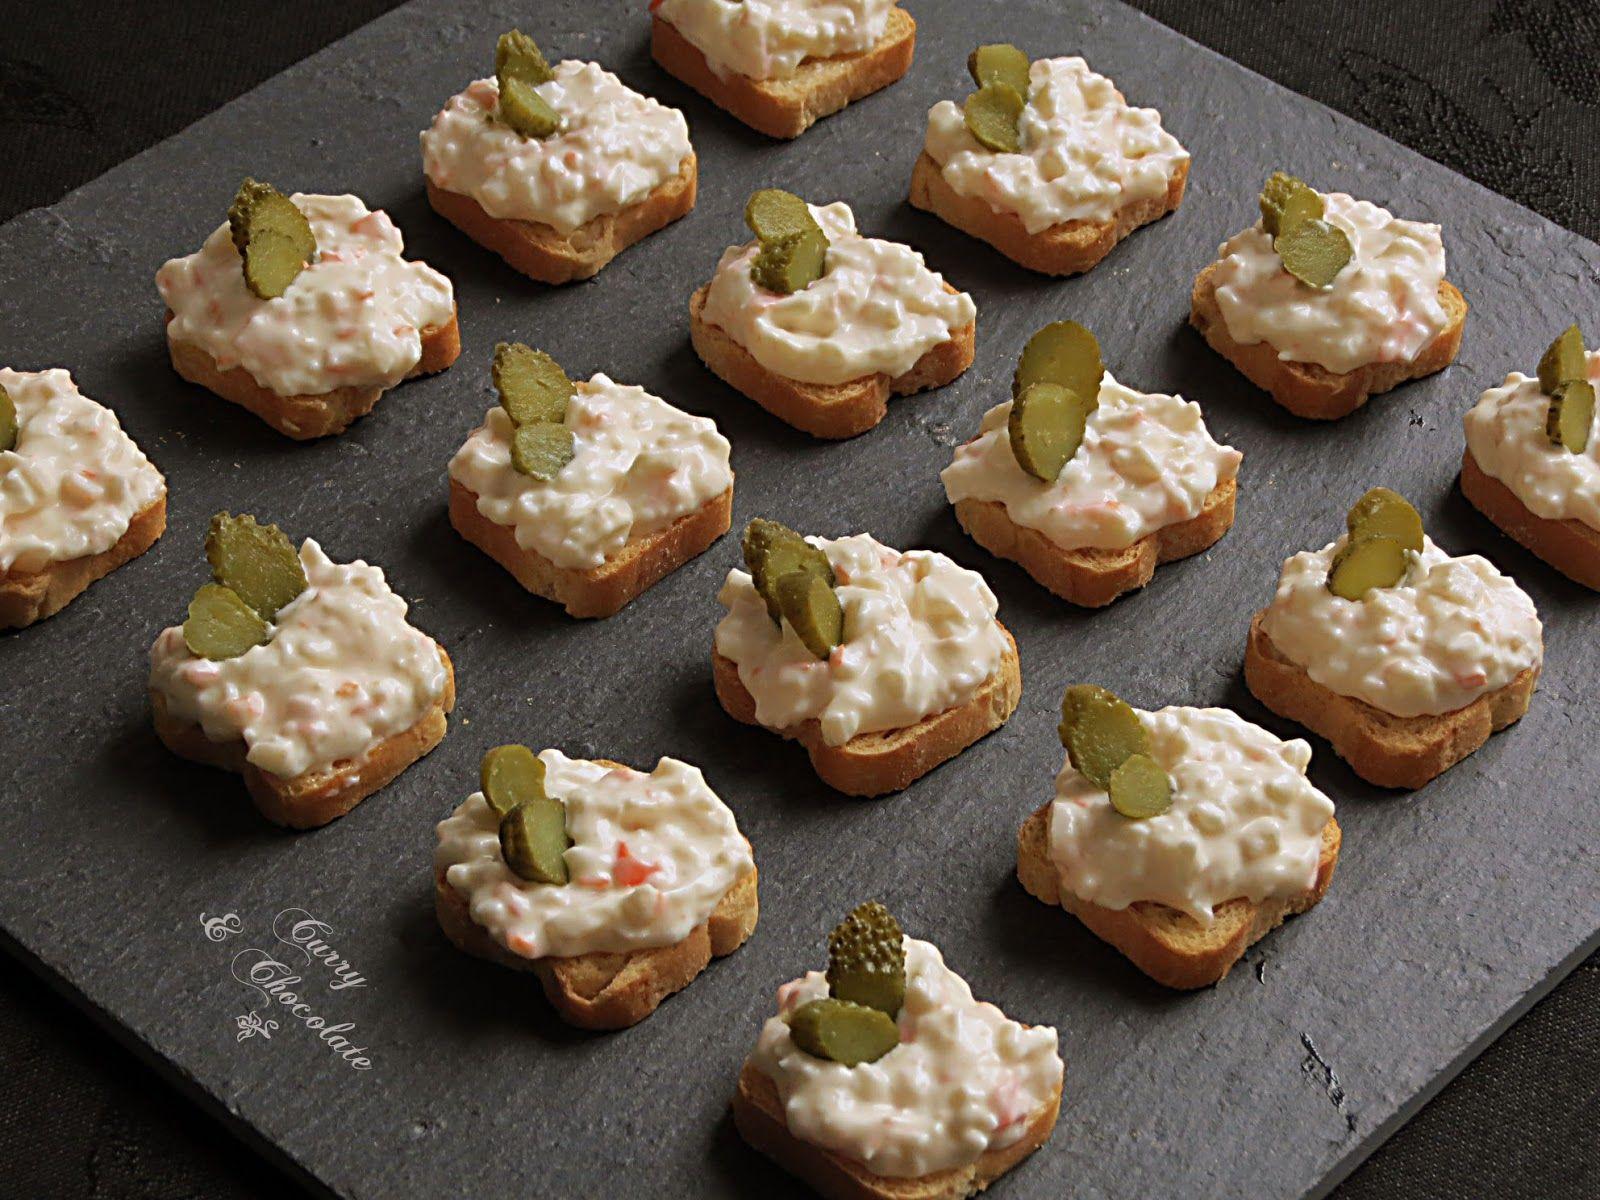 Canap s de palitos de cangrejo aperitivos pinterest for Canape de pate con cebolla caramelizada